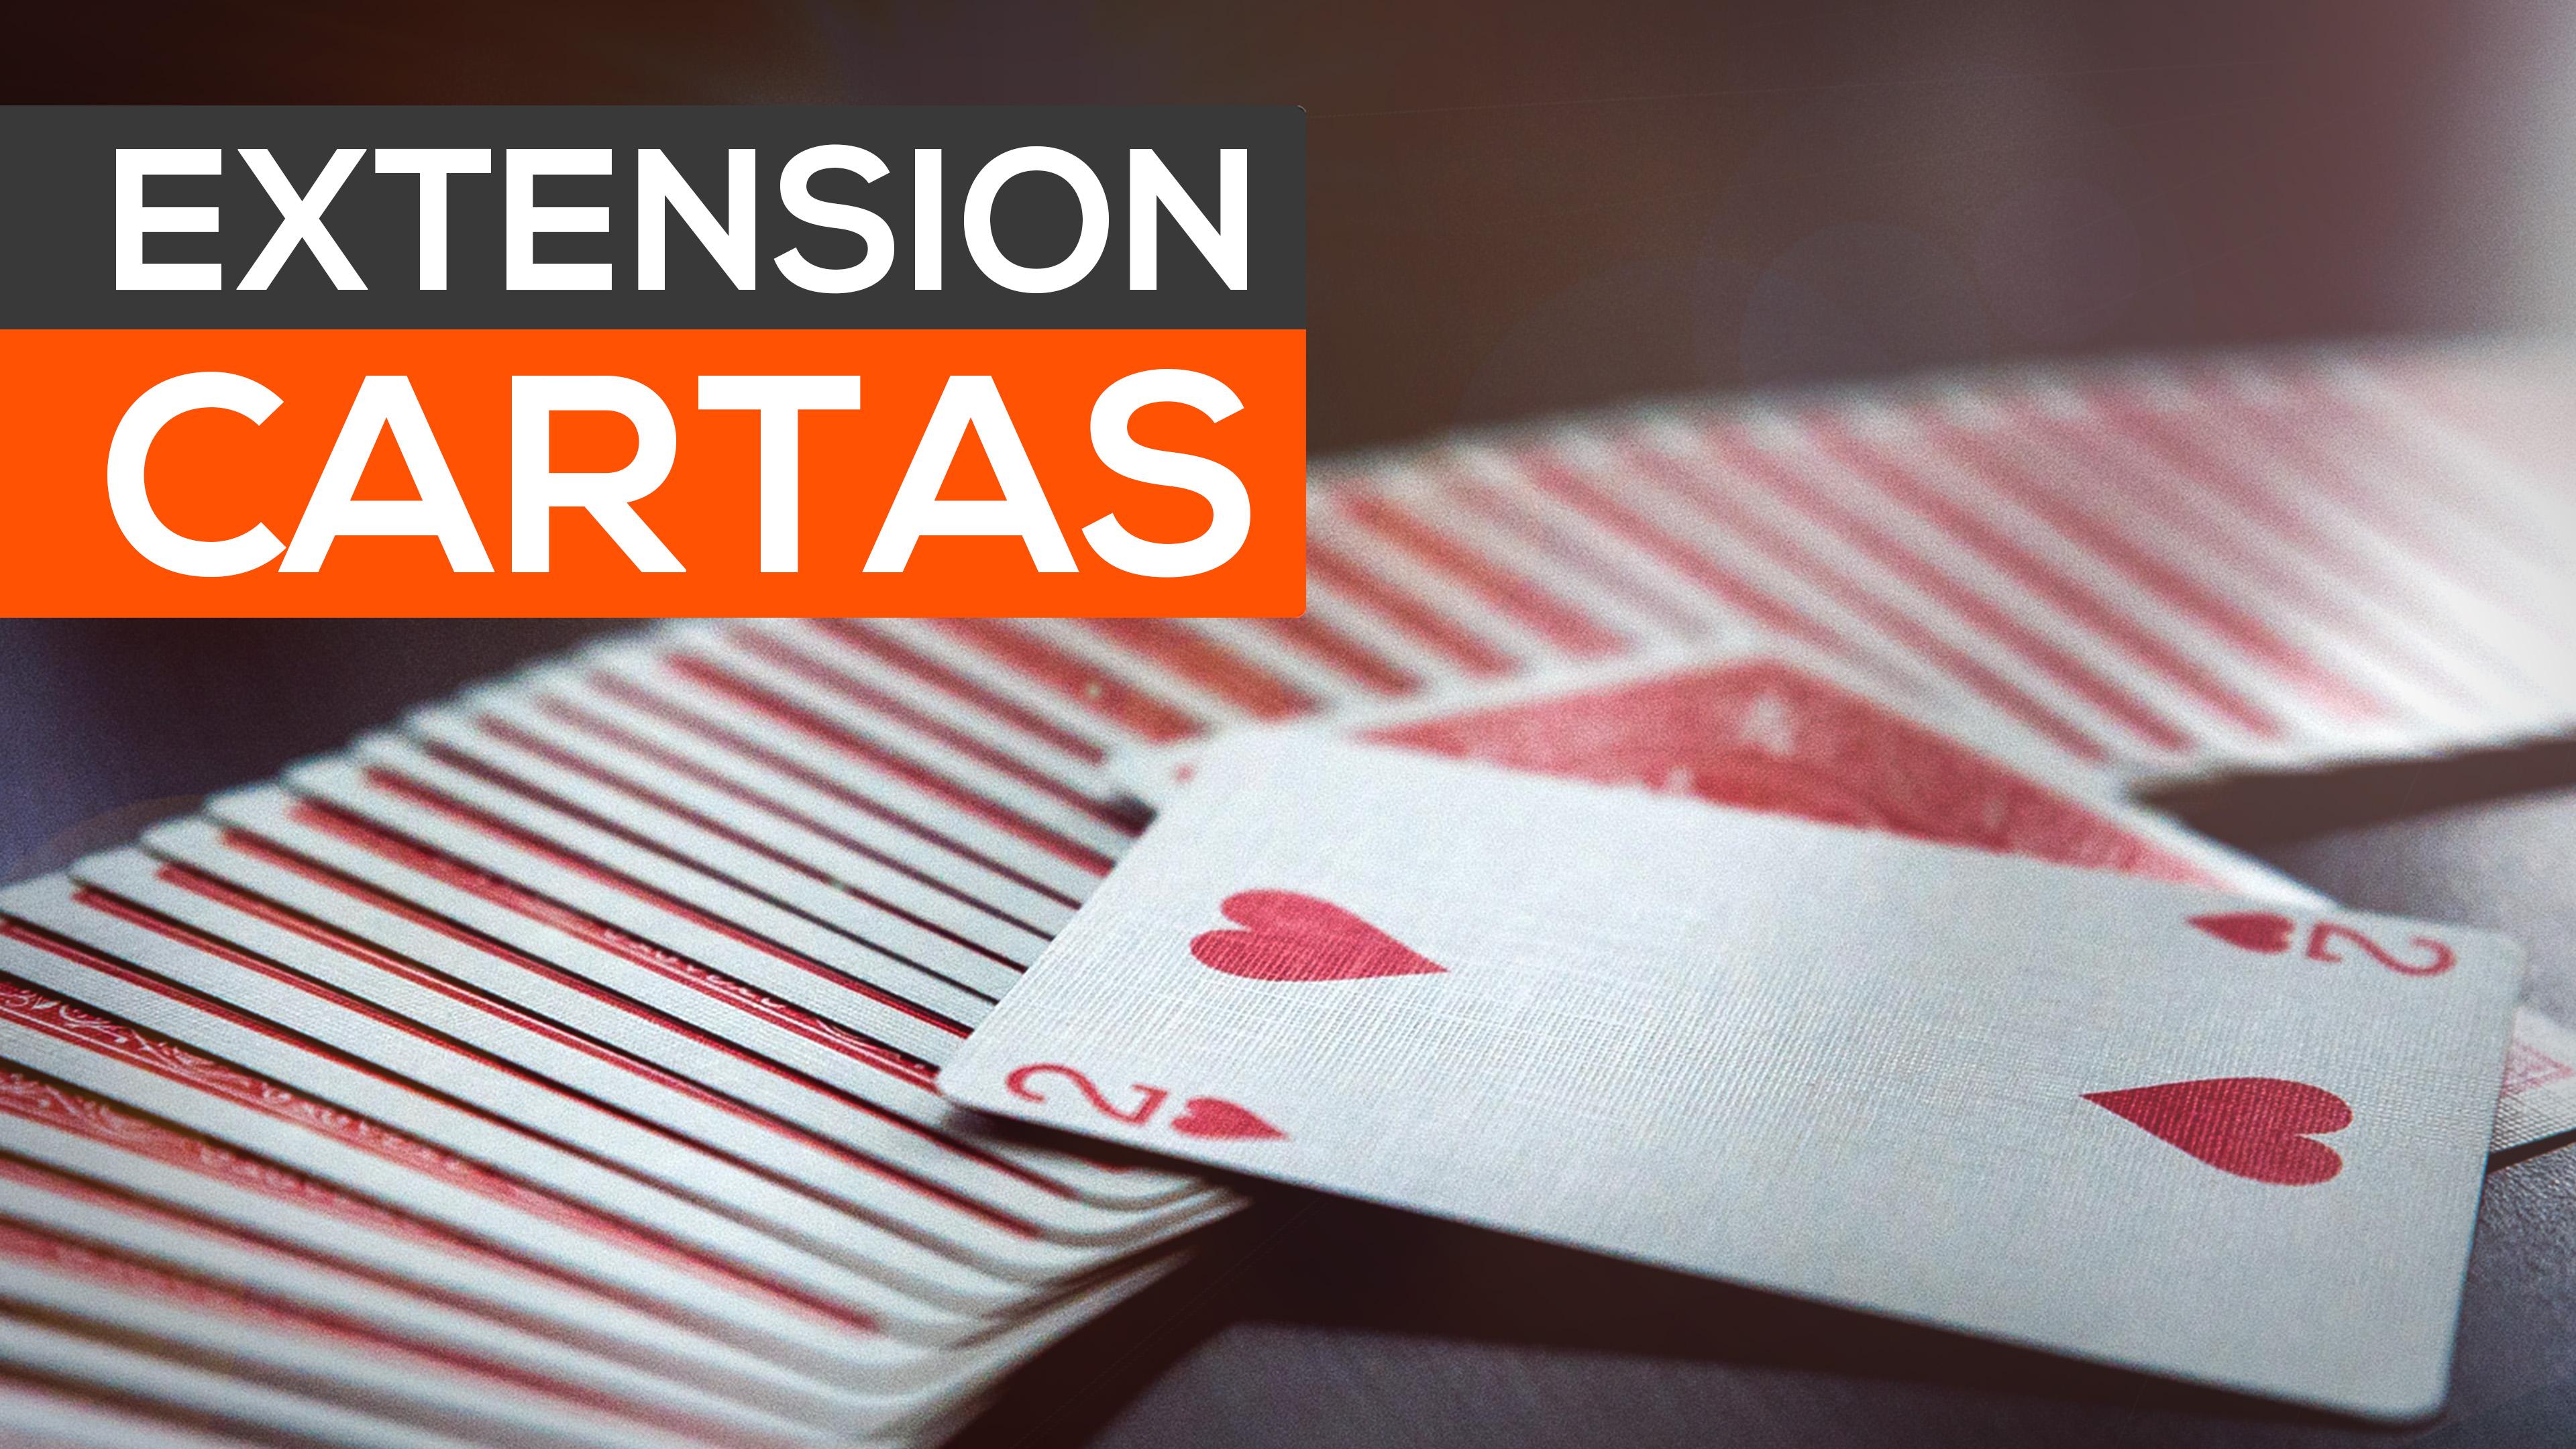 2016 - 03 - extension de cartas